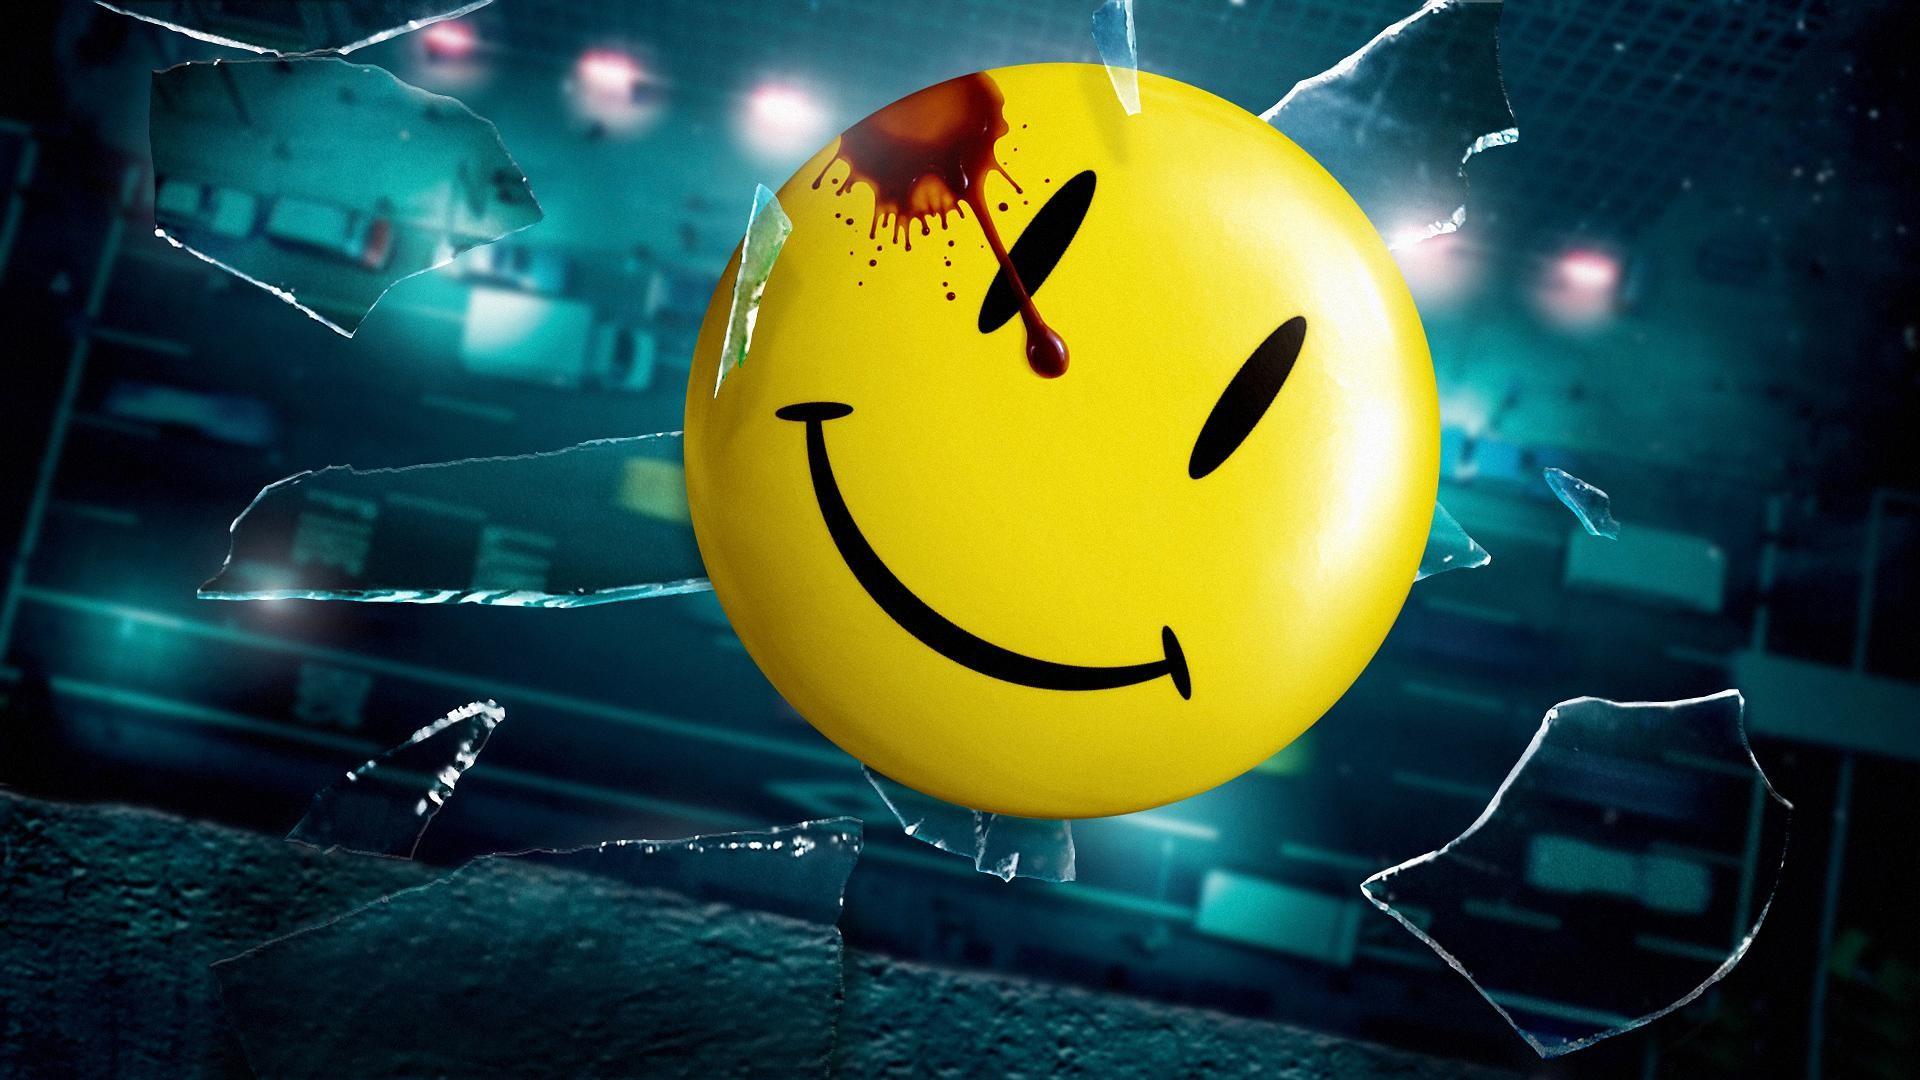 Smiley Broken Glass